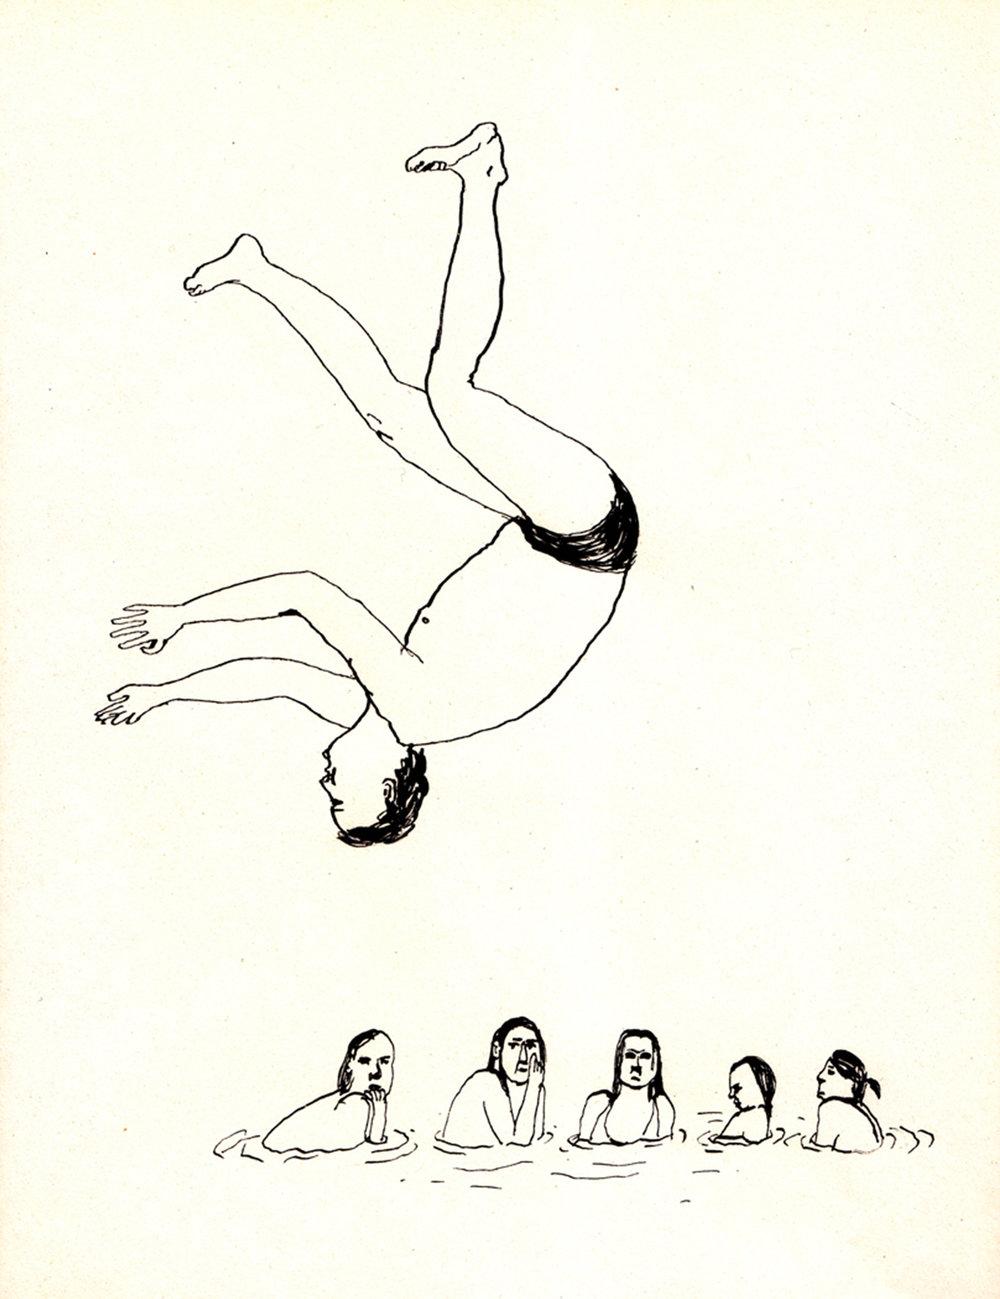 jochem springt   | inkt op papier